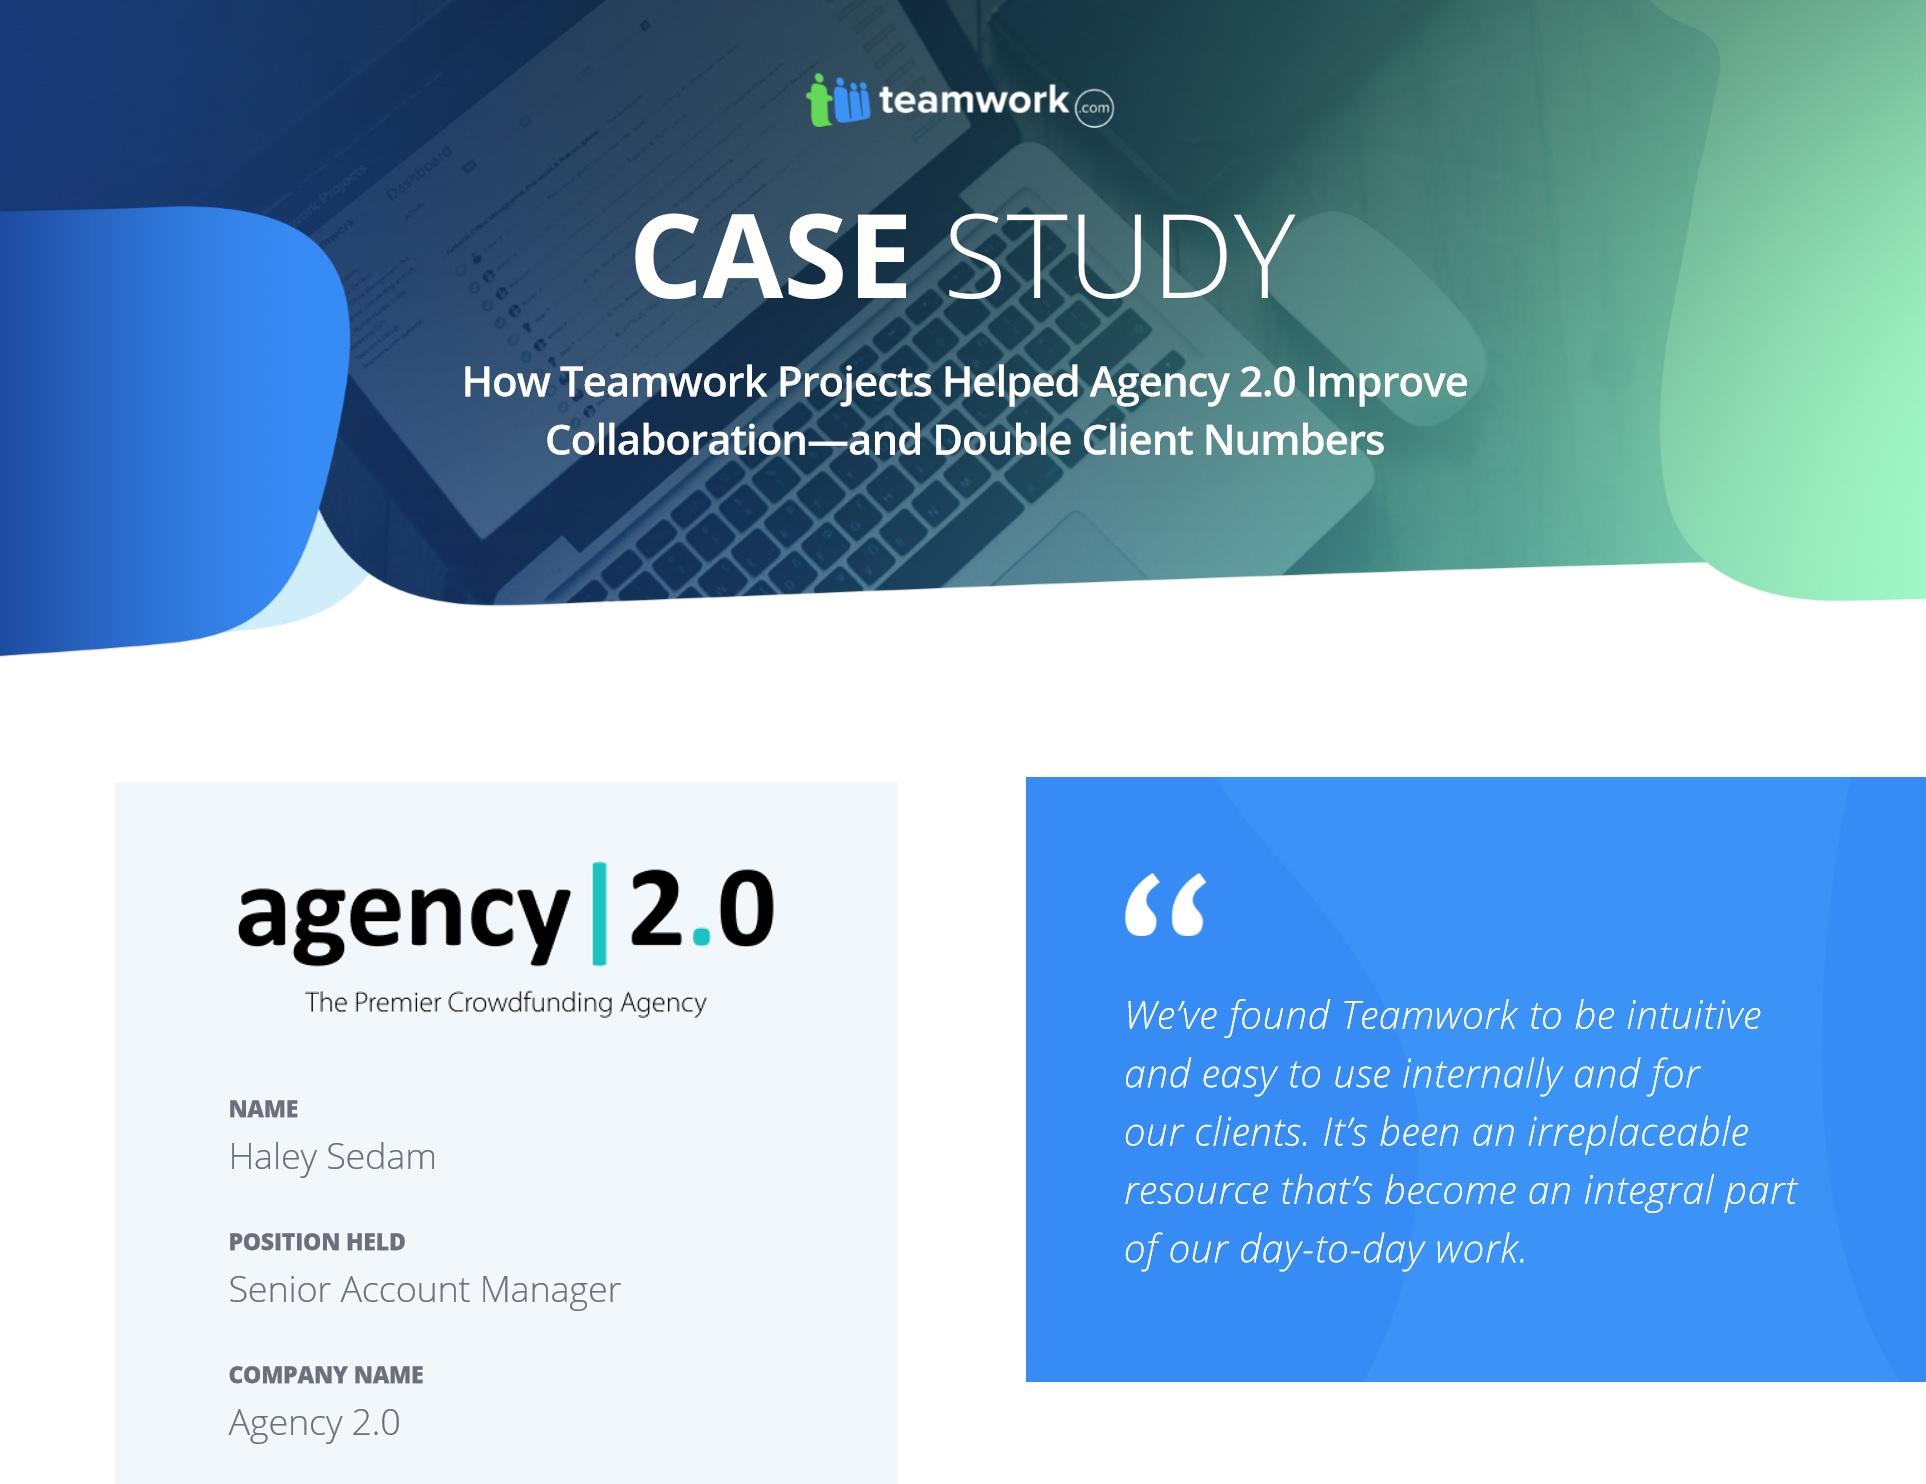 Agency 2.0